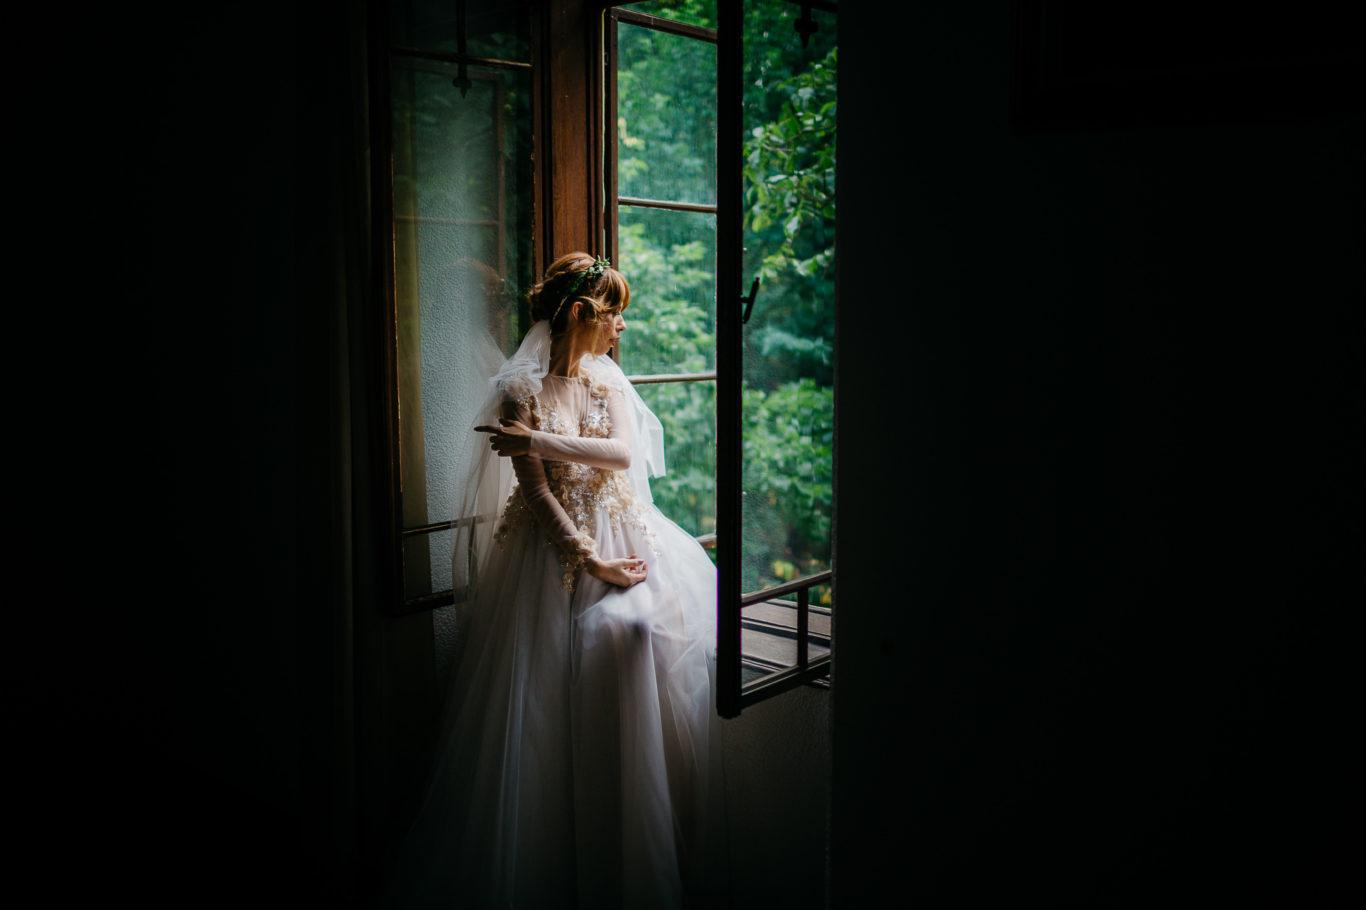 0130-Fotografie-nunta-Stirbey-Laura-Rares-fotograf-Ciprian-Dumitrescu-DCF_3247